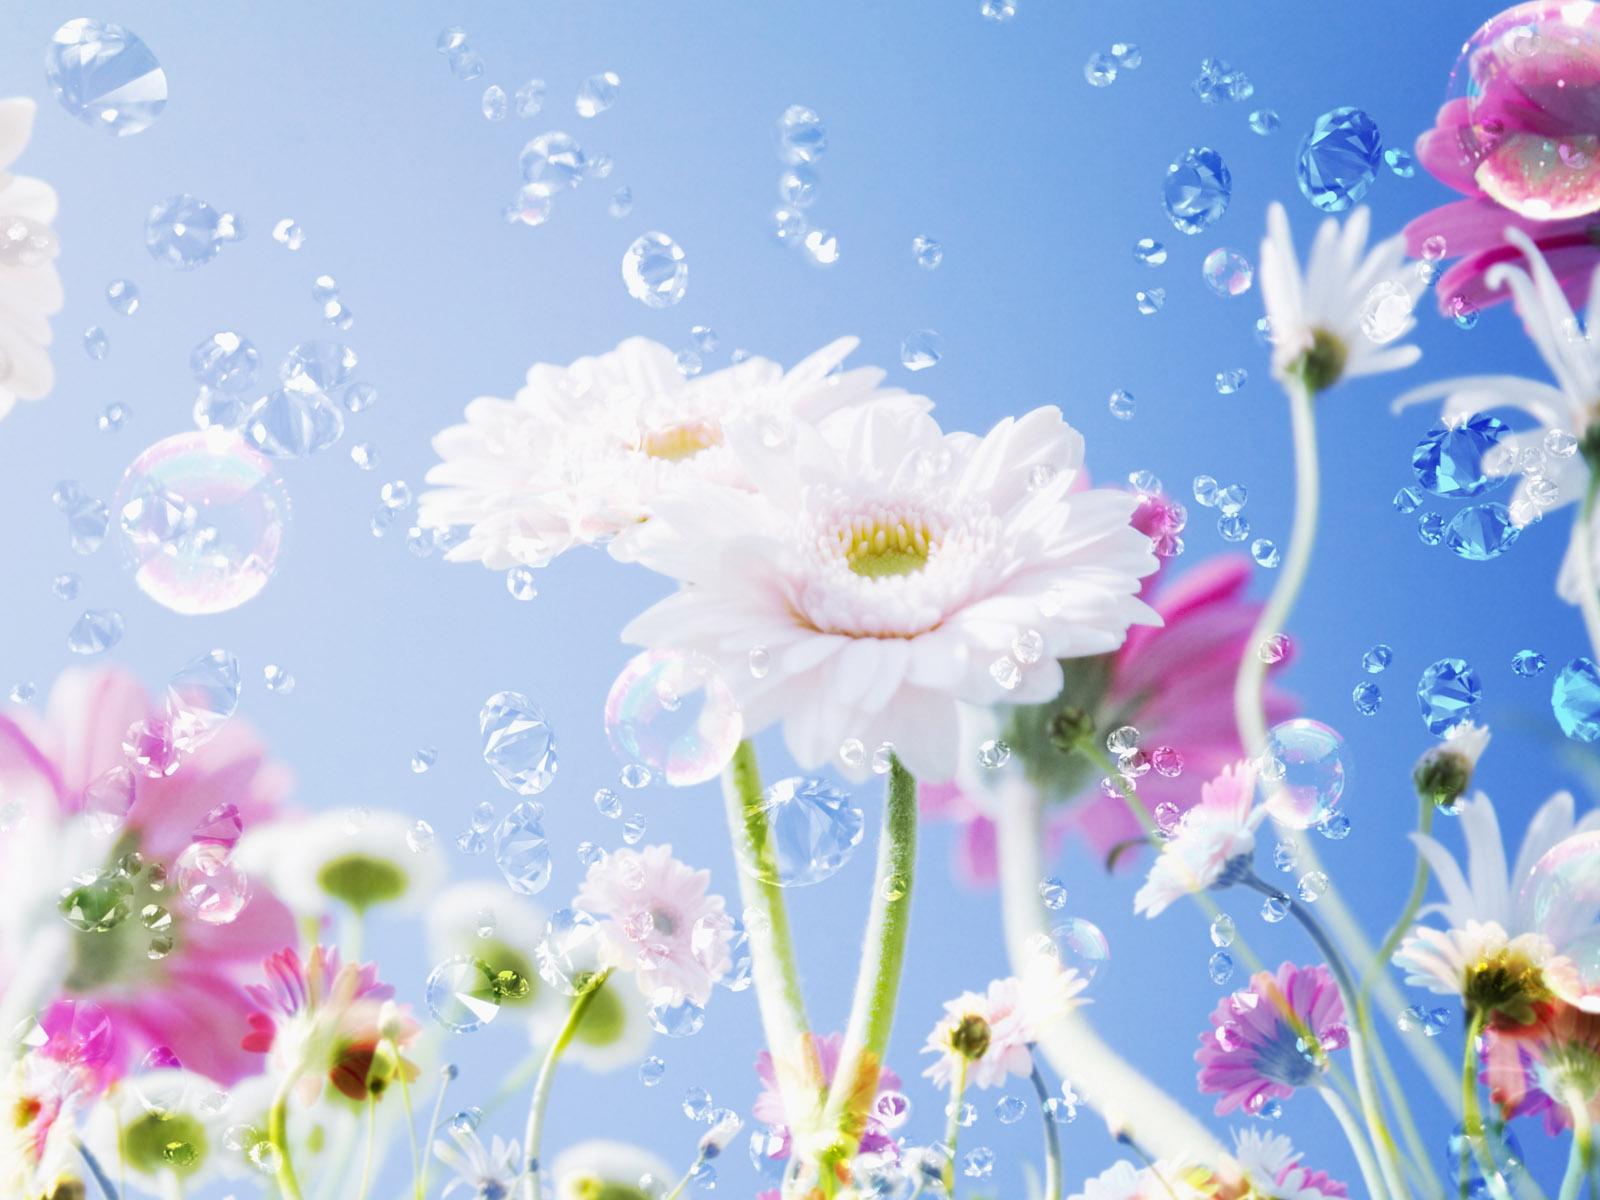 http://4.bp.blogspot.com/-NzqmJrr0gmE/UH6GlyVB7QI/AAAAAAAAAFM/a_ctqz5Y8Oc/s1600/Flowers%2BWallpapers.jpg